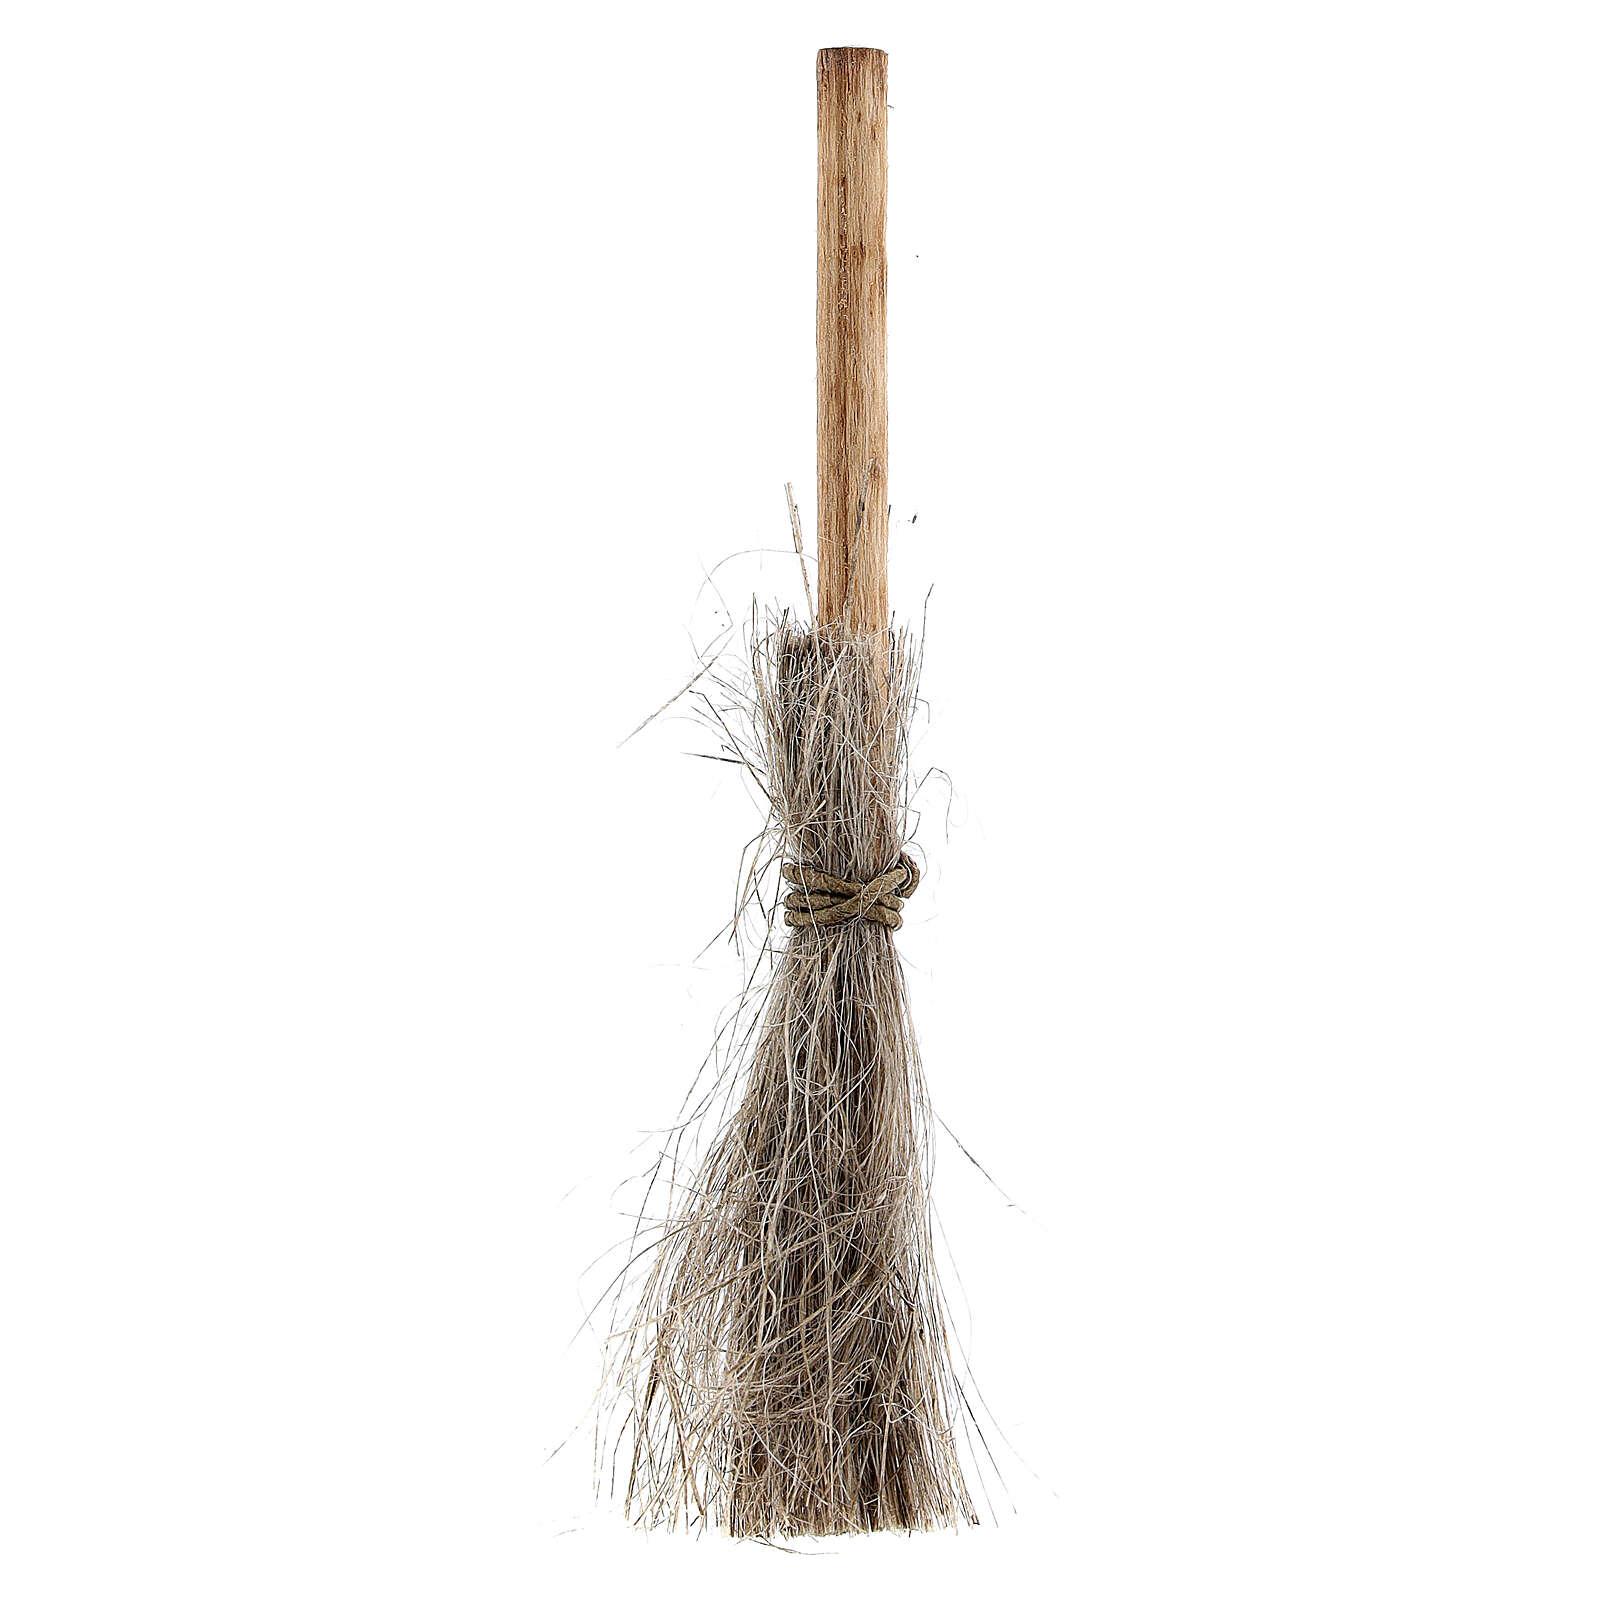 Straw broom h 8 cm for Nativity Scene with 10-12 cm figurines 4